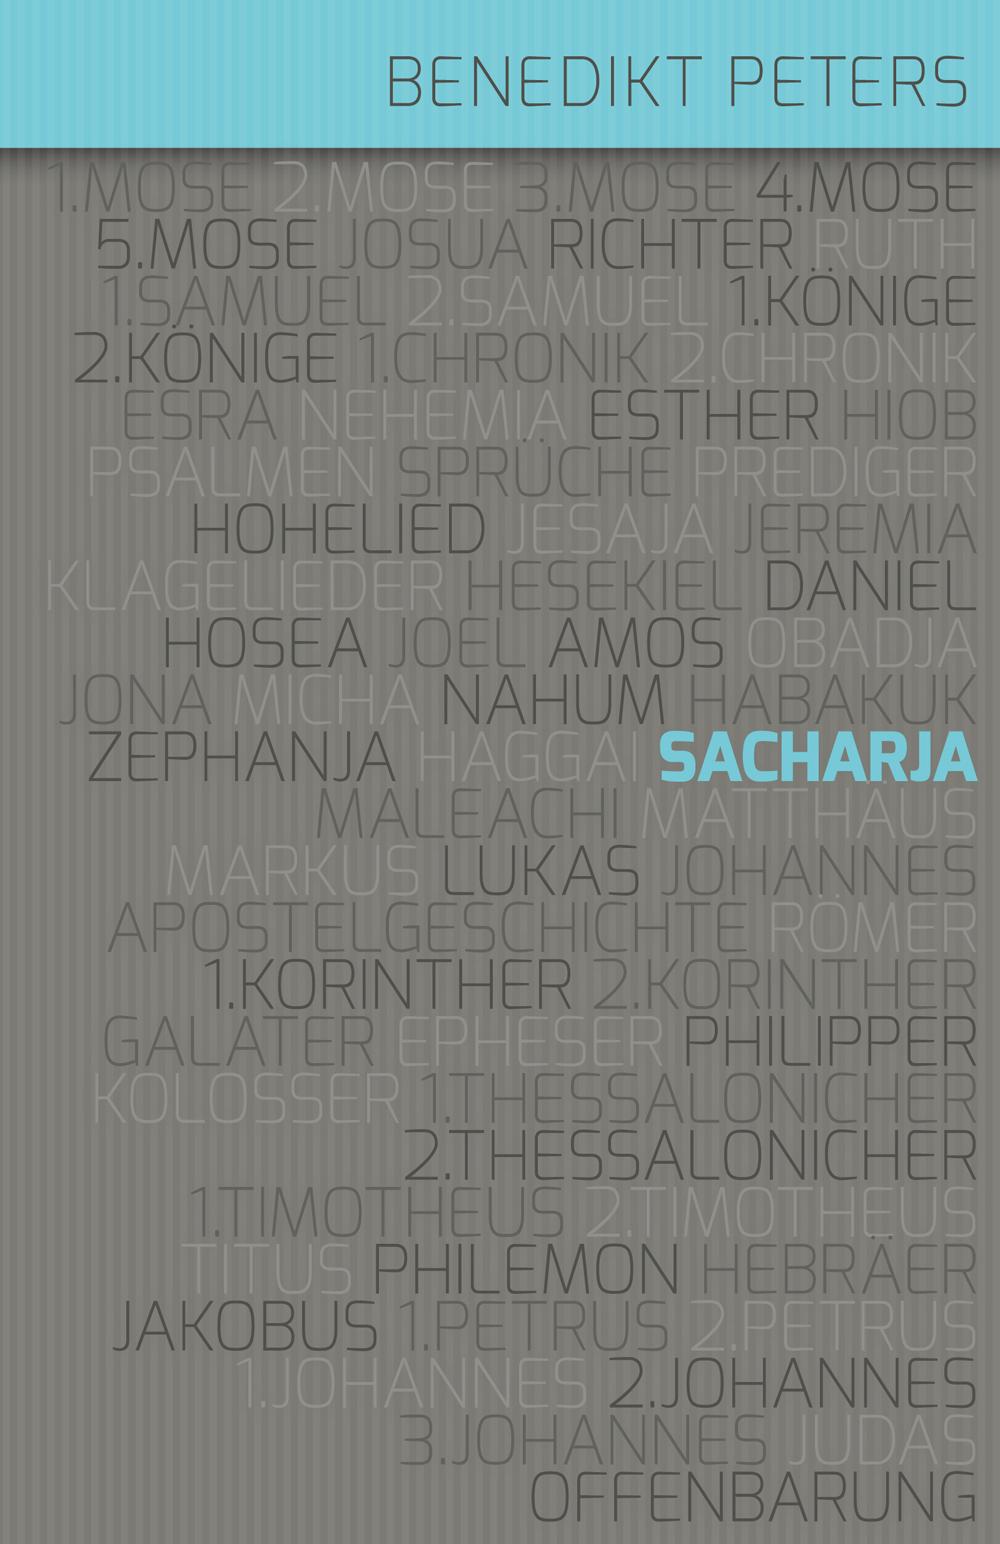 CLV_kommentar-zu-sacharja_benedikt-peters_256314_1